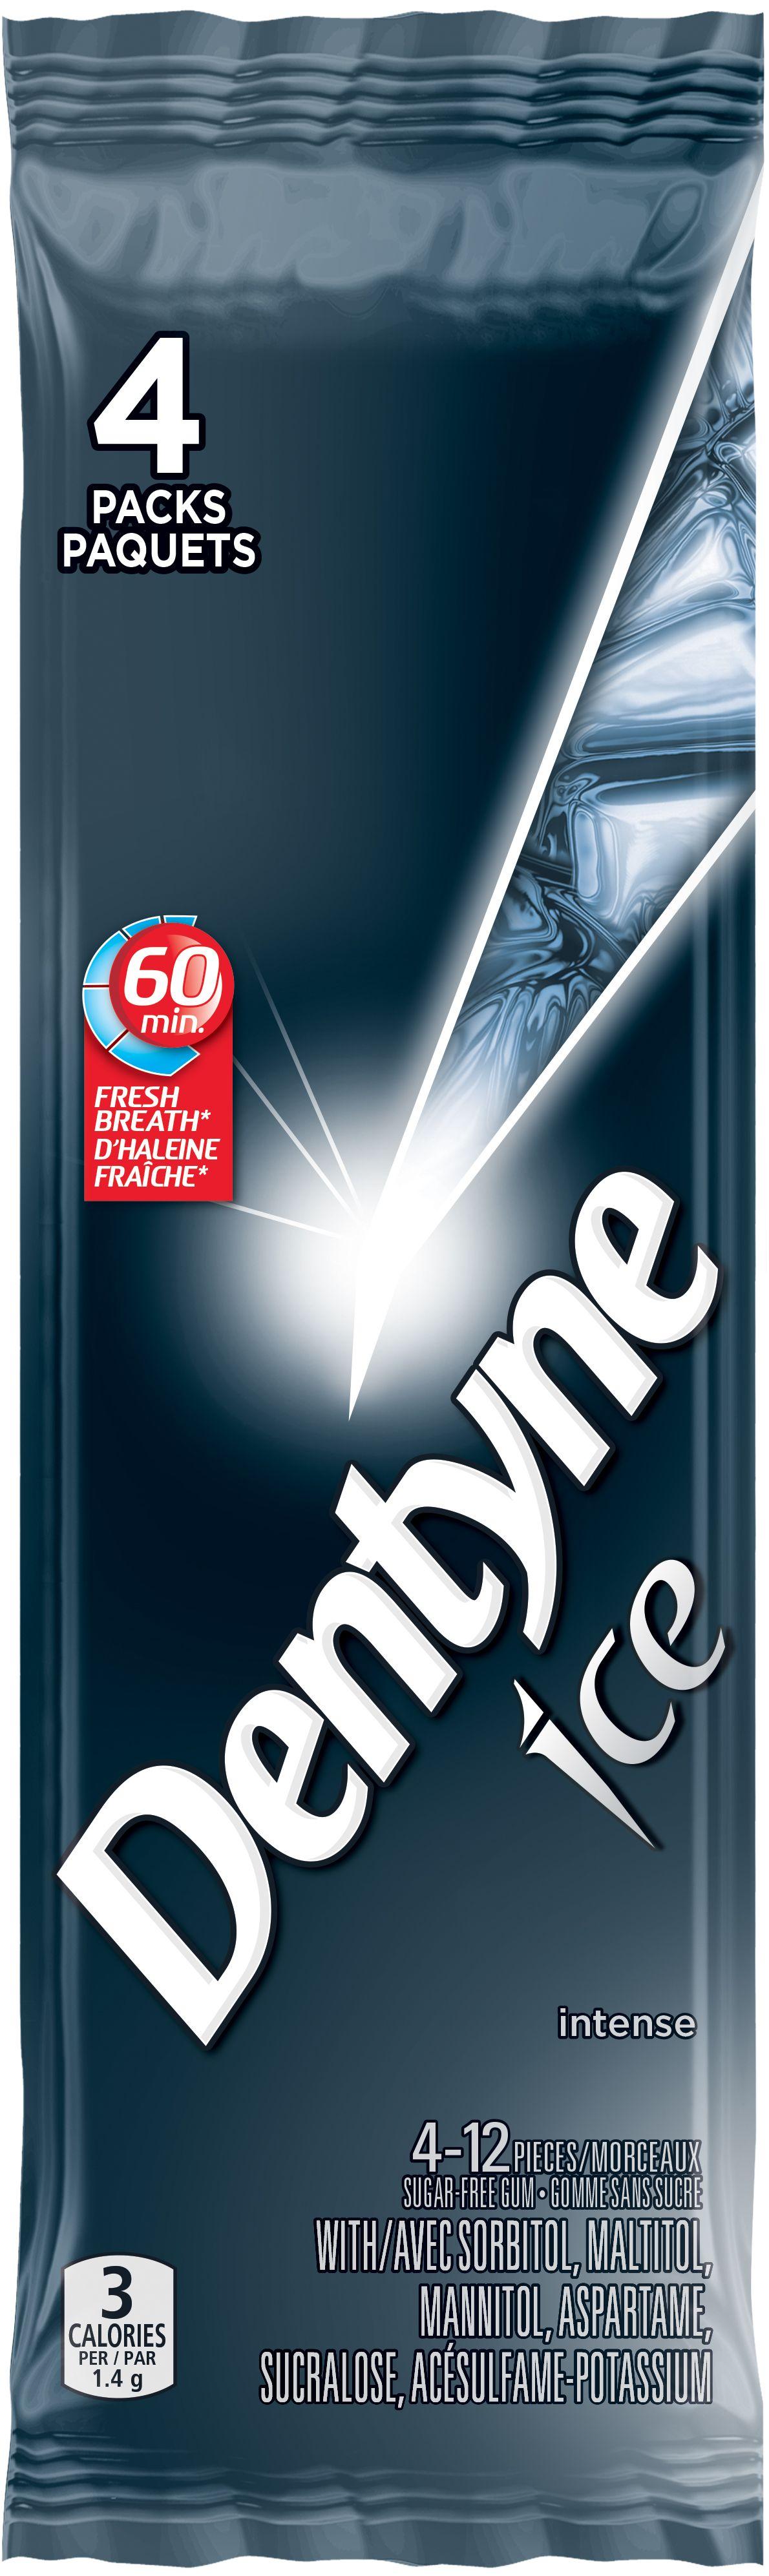 Dentyne Ice Intense Gum 48 Count